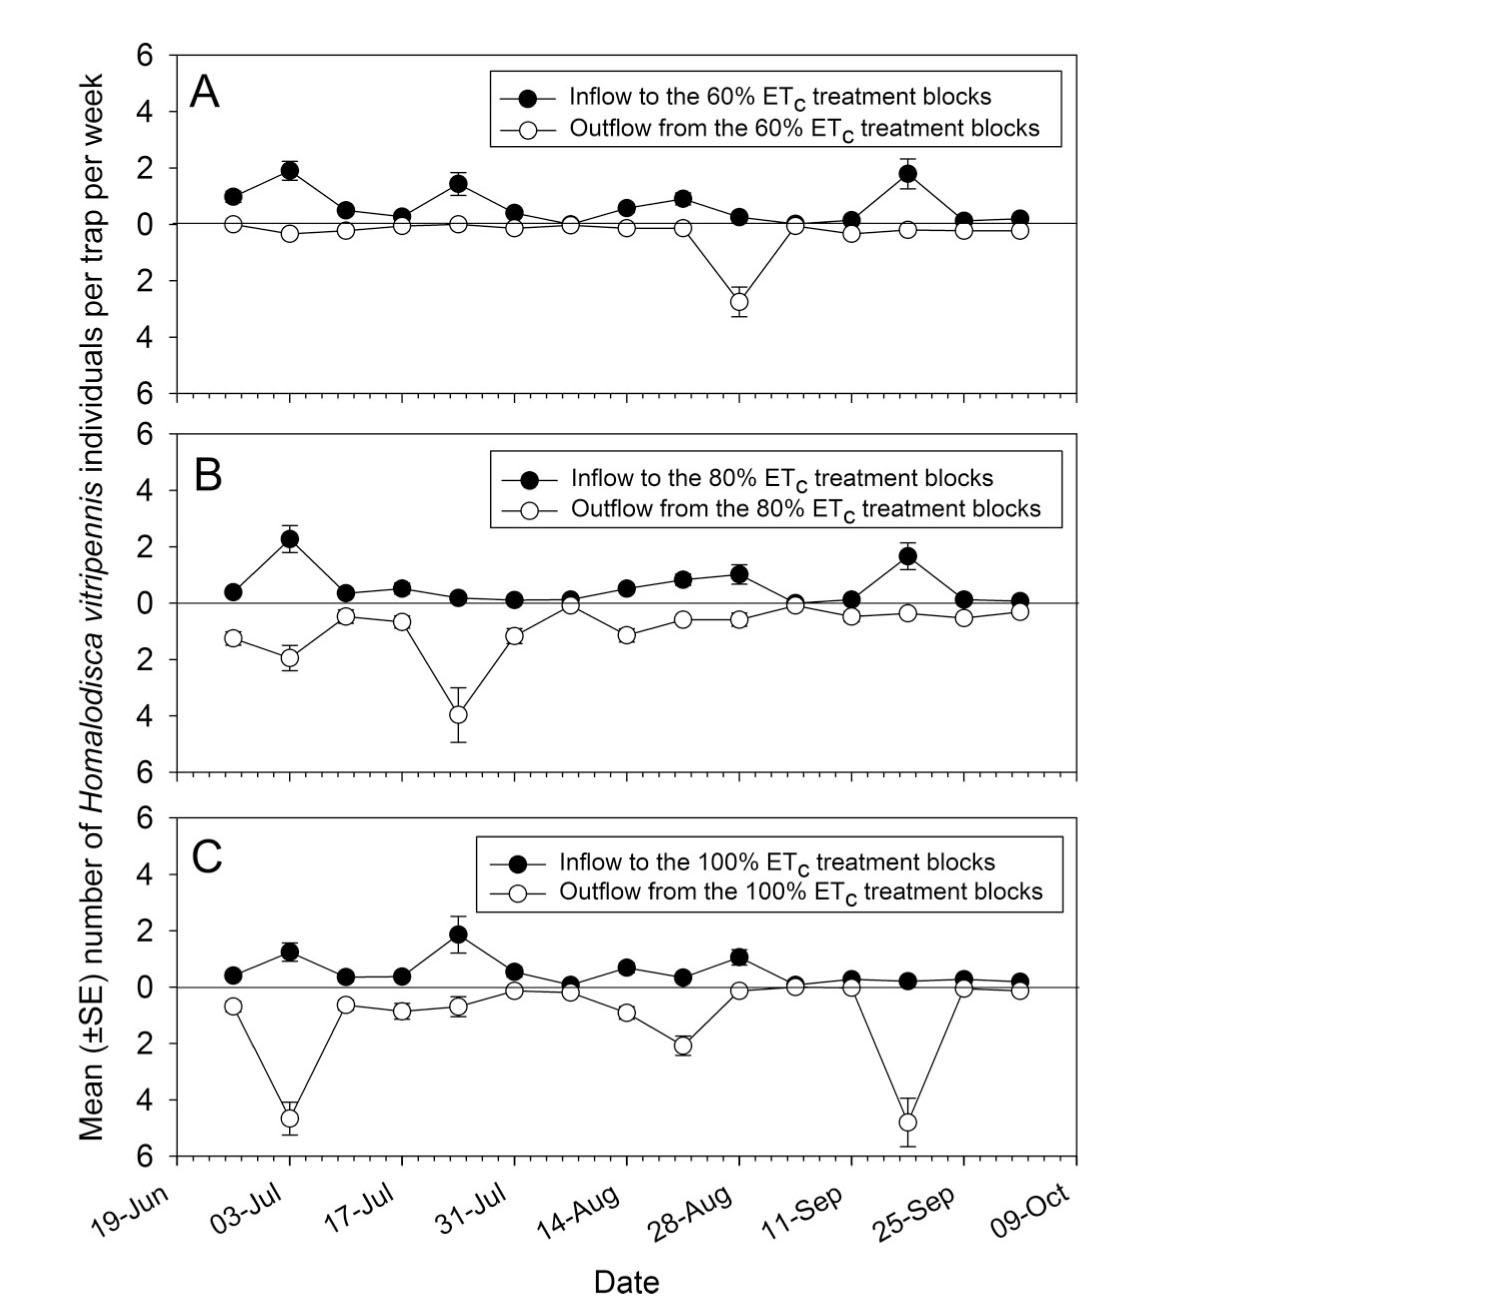 hight resolution of mean se number of h vitripennis captured during the 2006 sampling season after entering upper half of graphs and leaving lower half of graphs